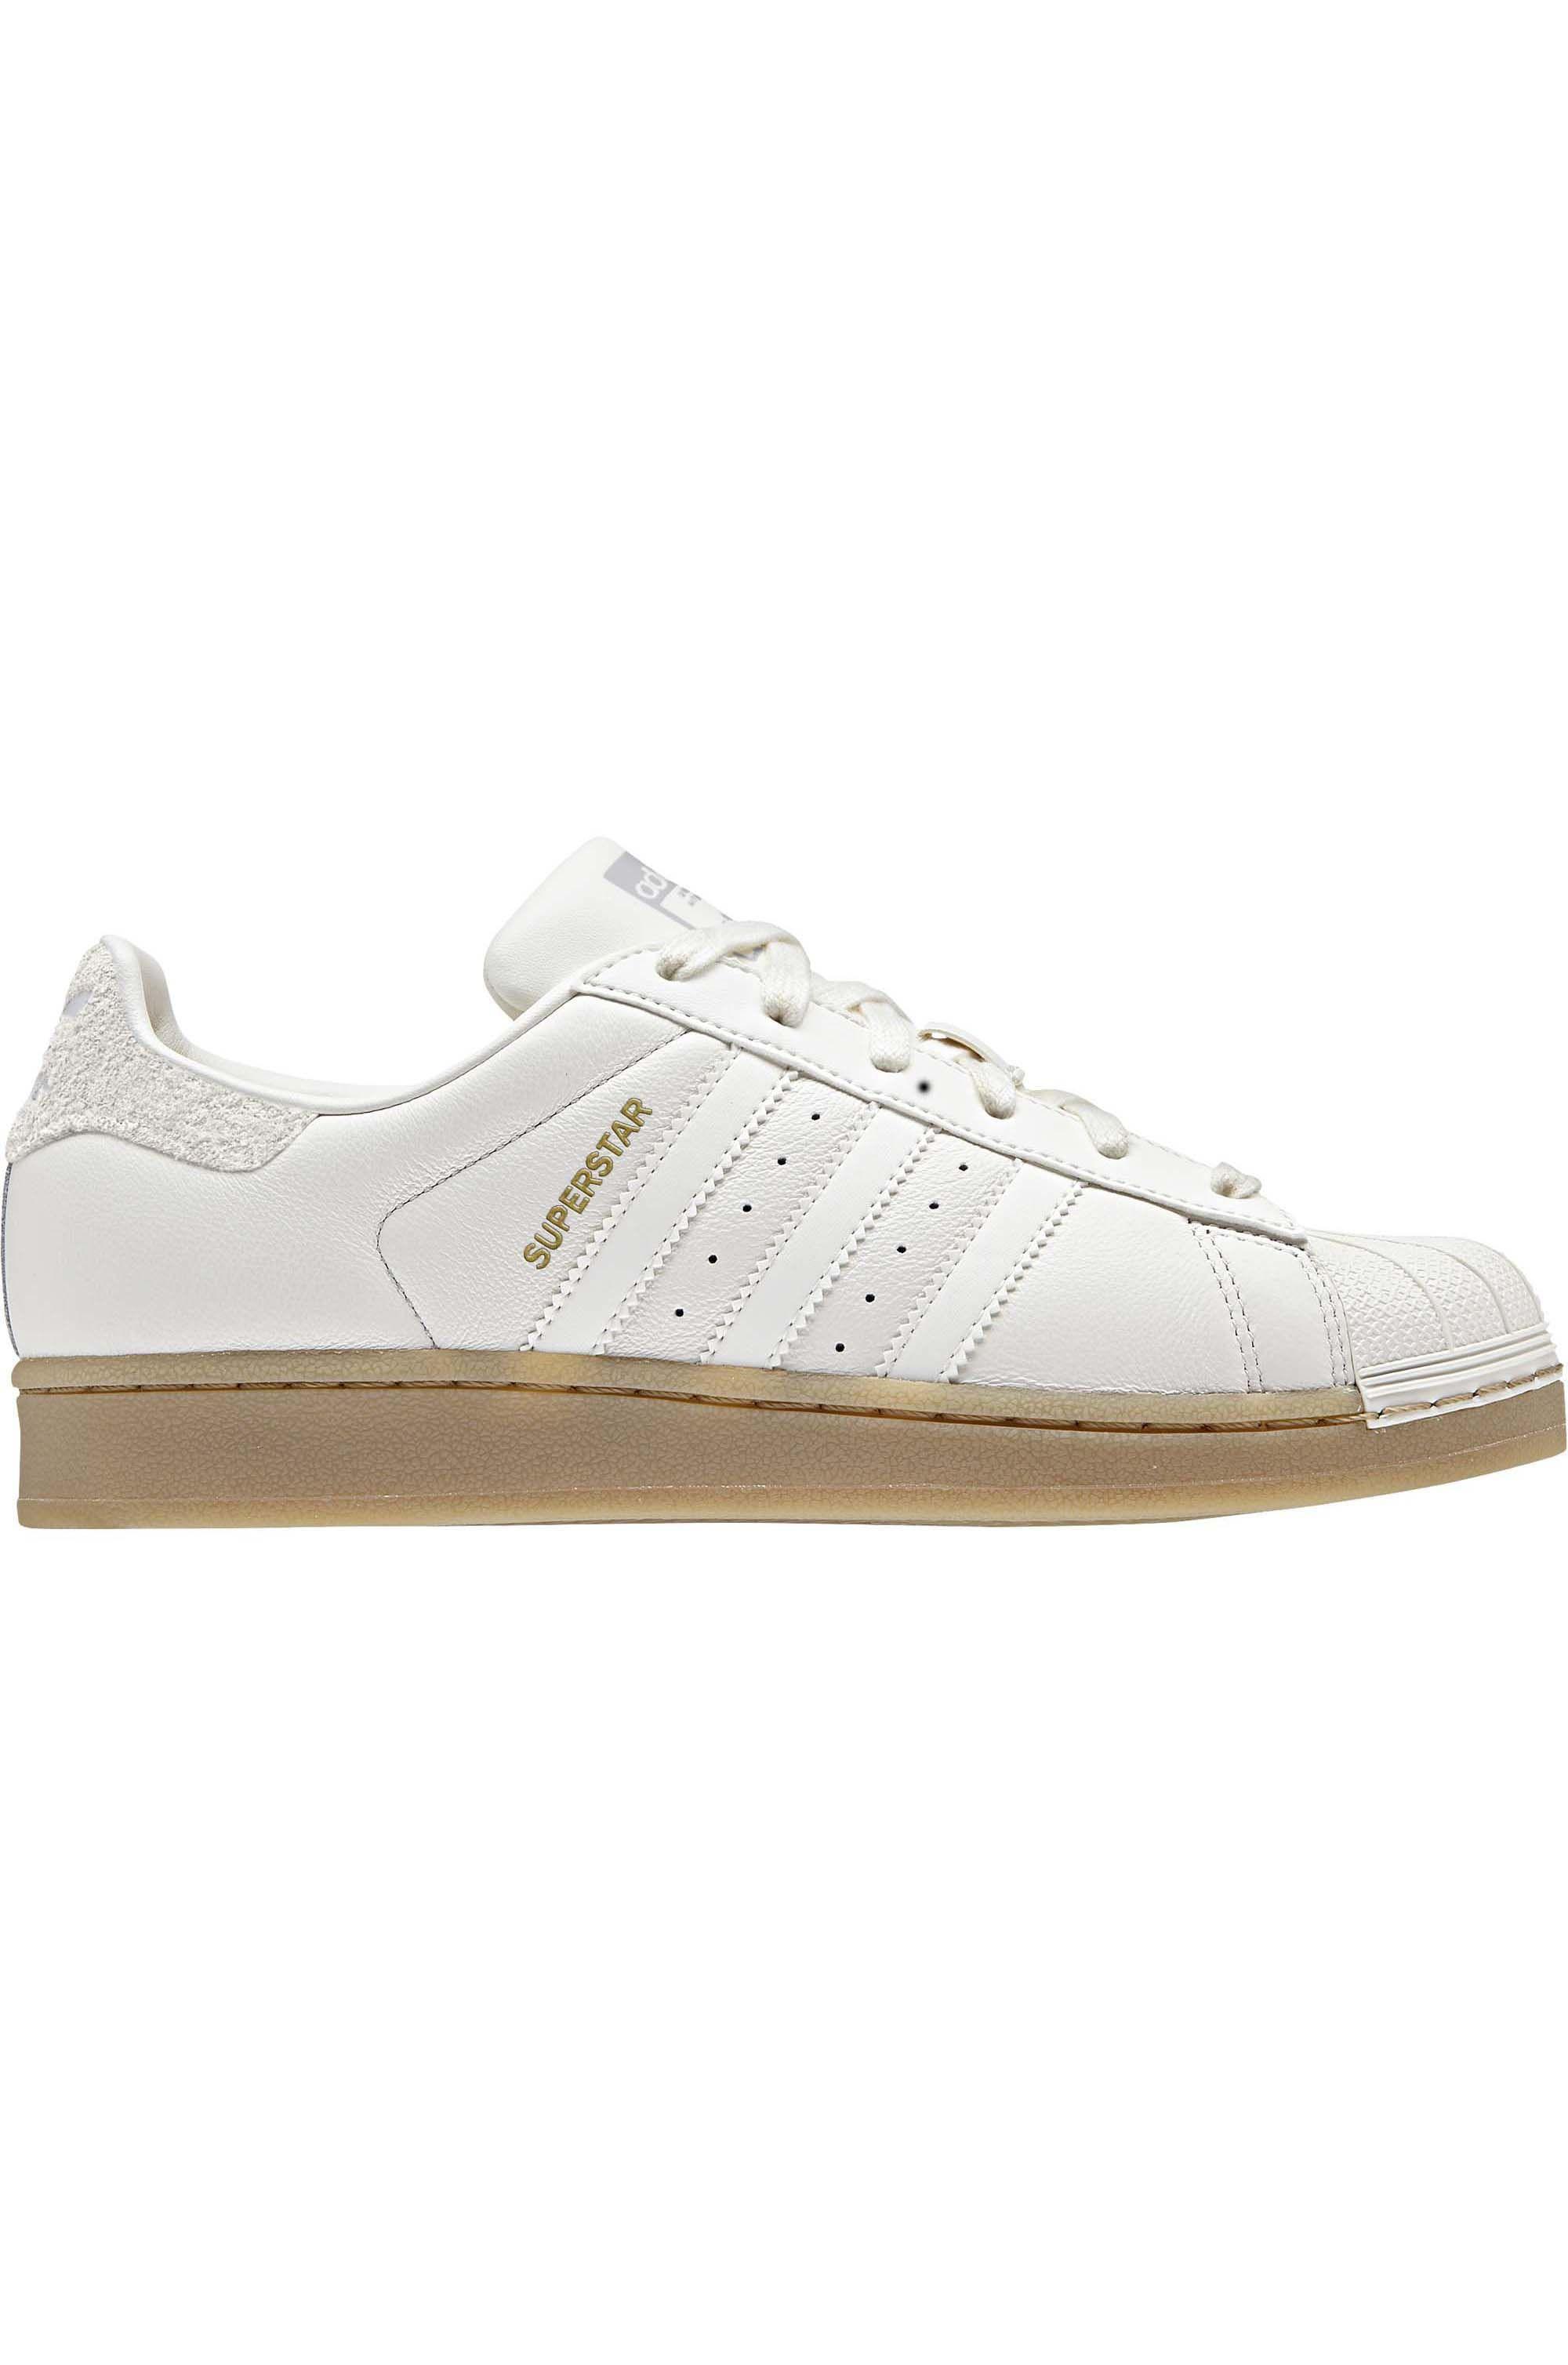 Adidas Shoes SUPERSTAR W Cloud WhiteCloud WhiteGum4